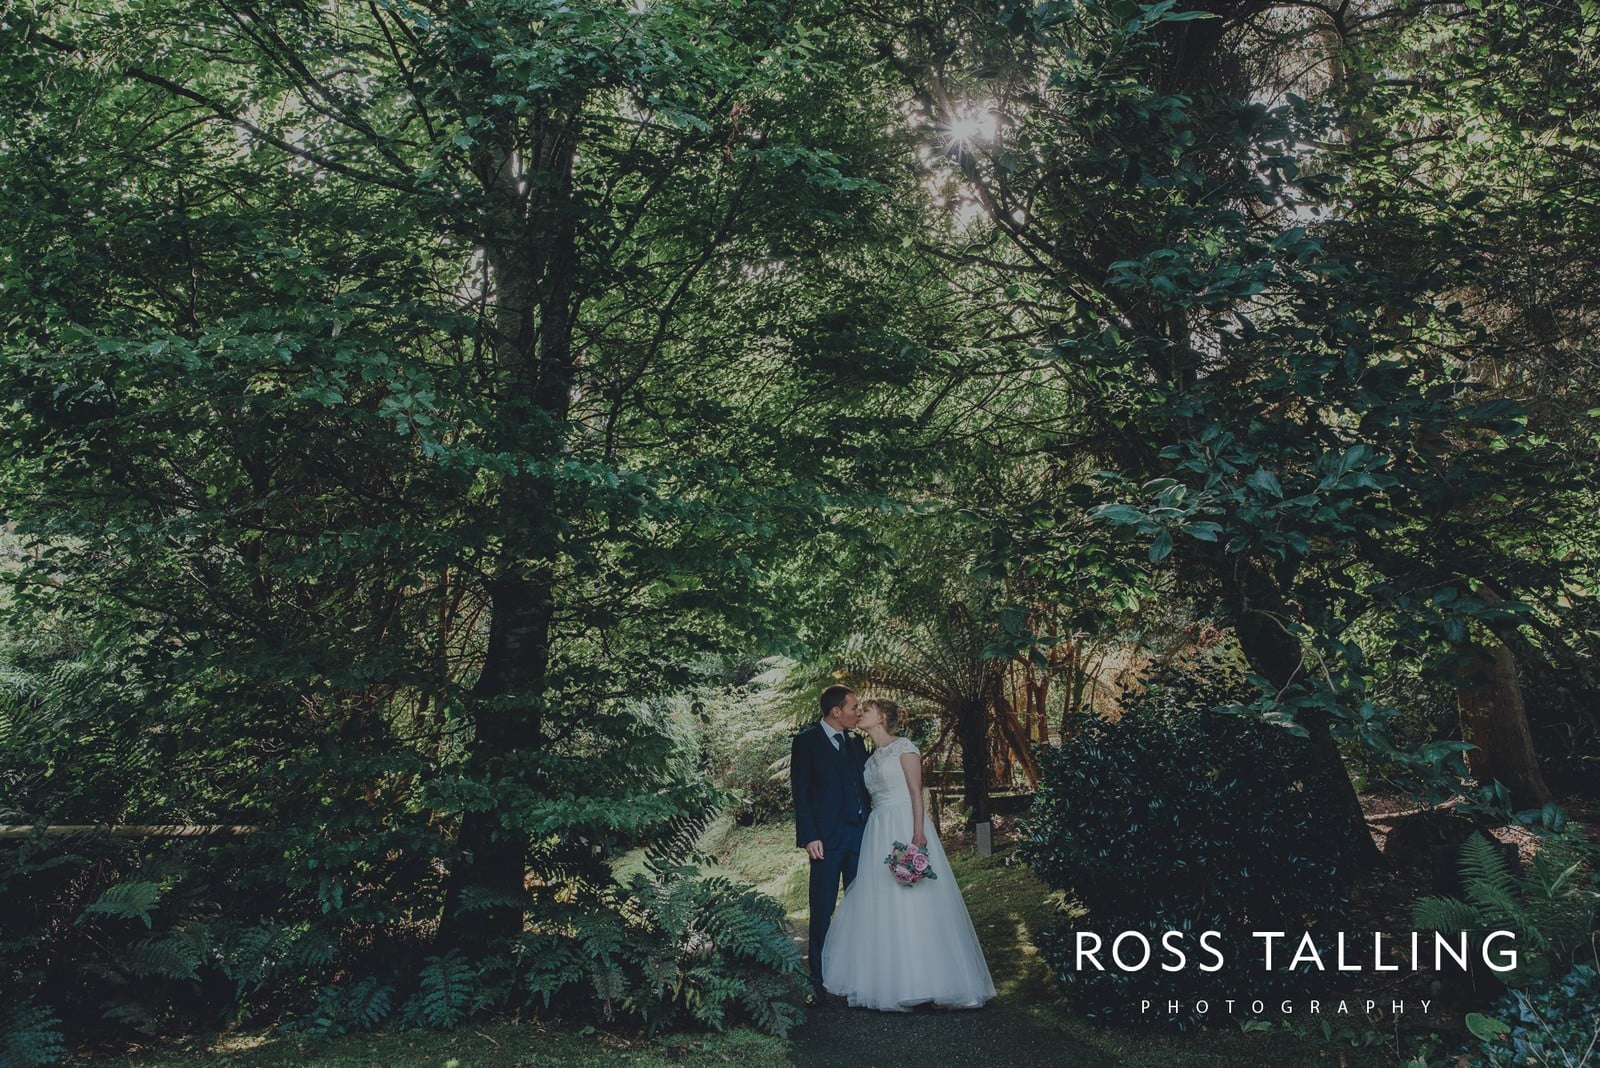 laura-matts-rosevine-hotel-wedding-photography-cornwall_0103